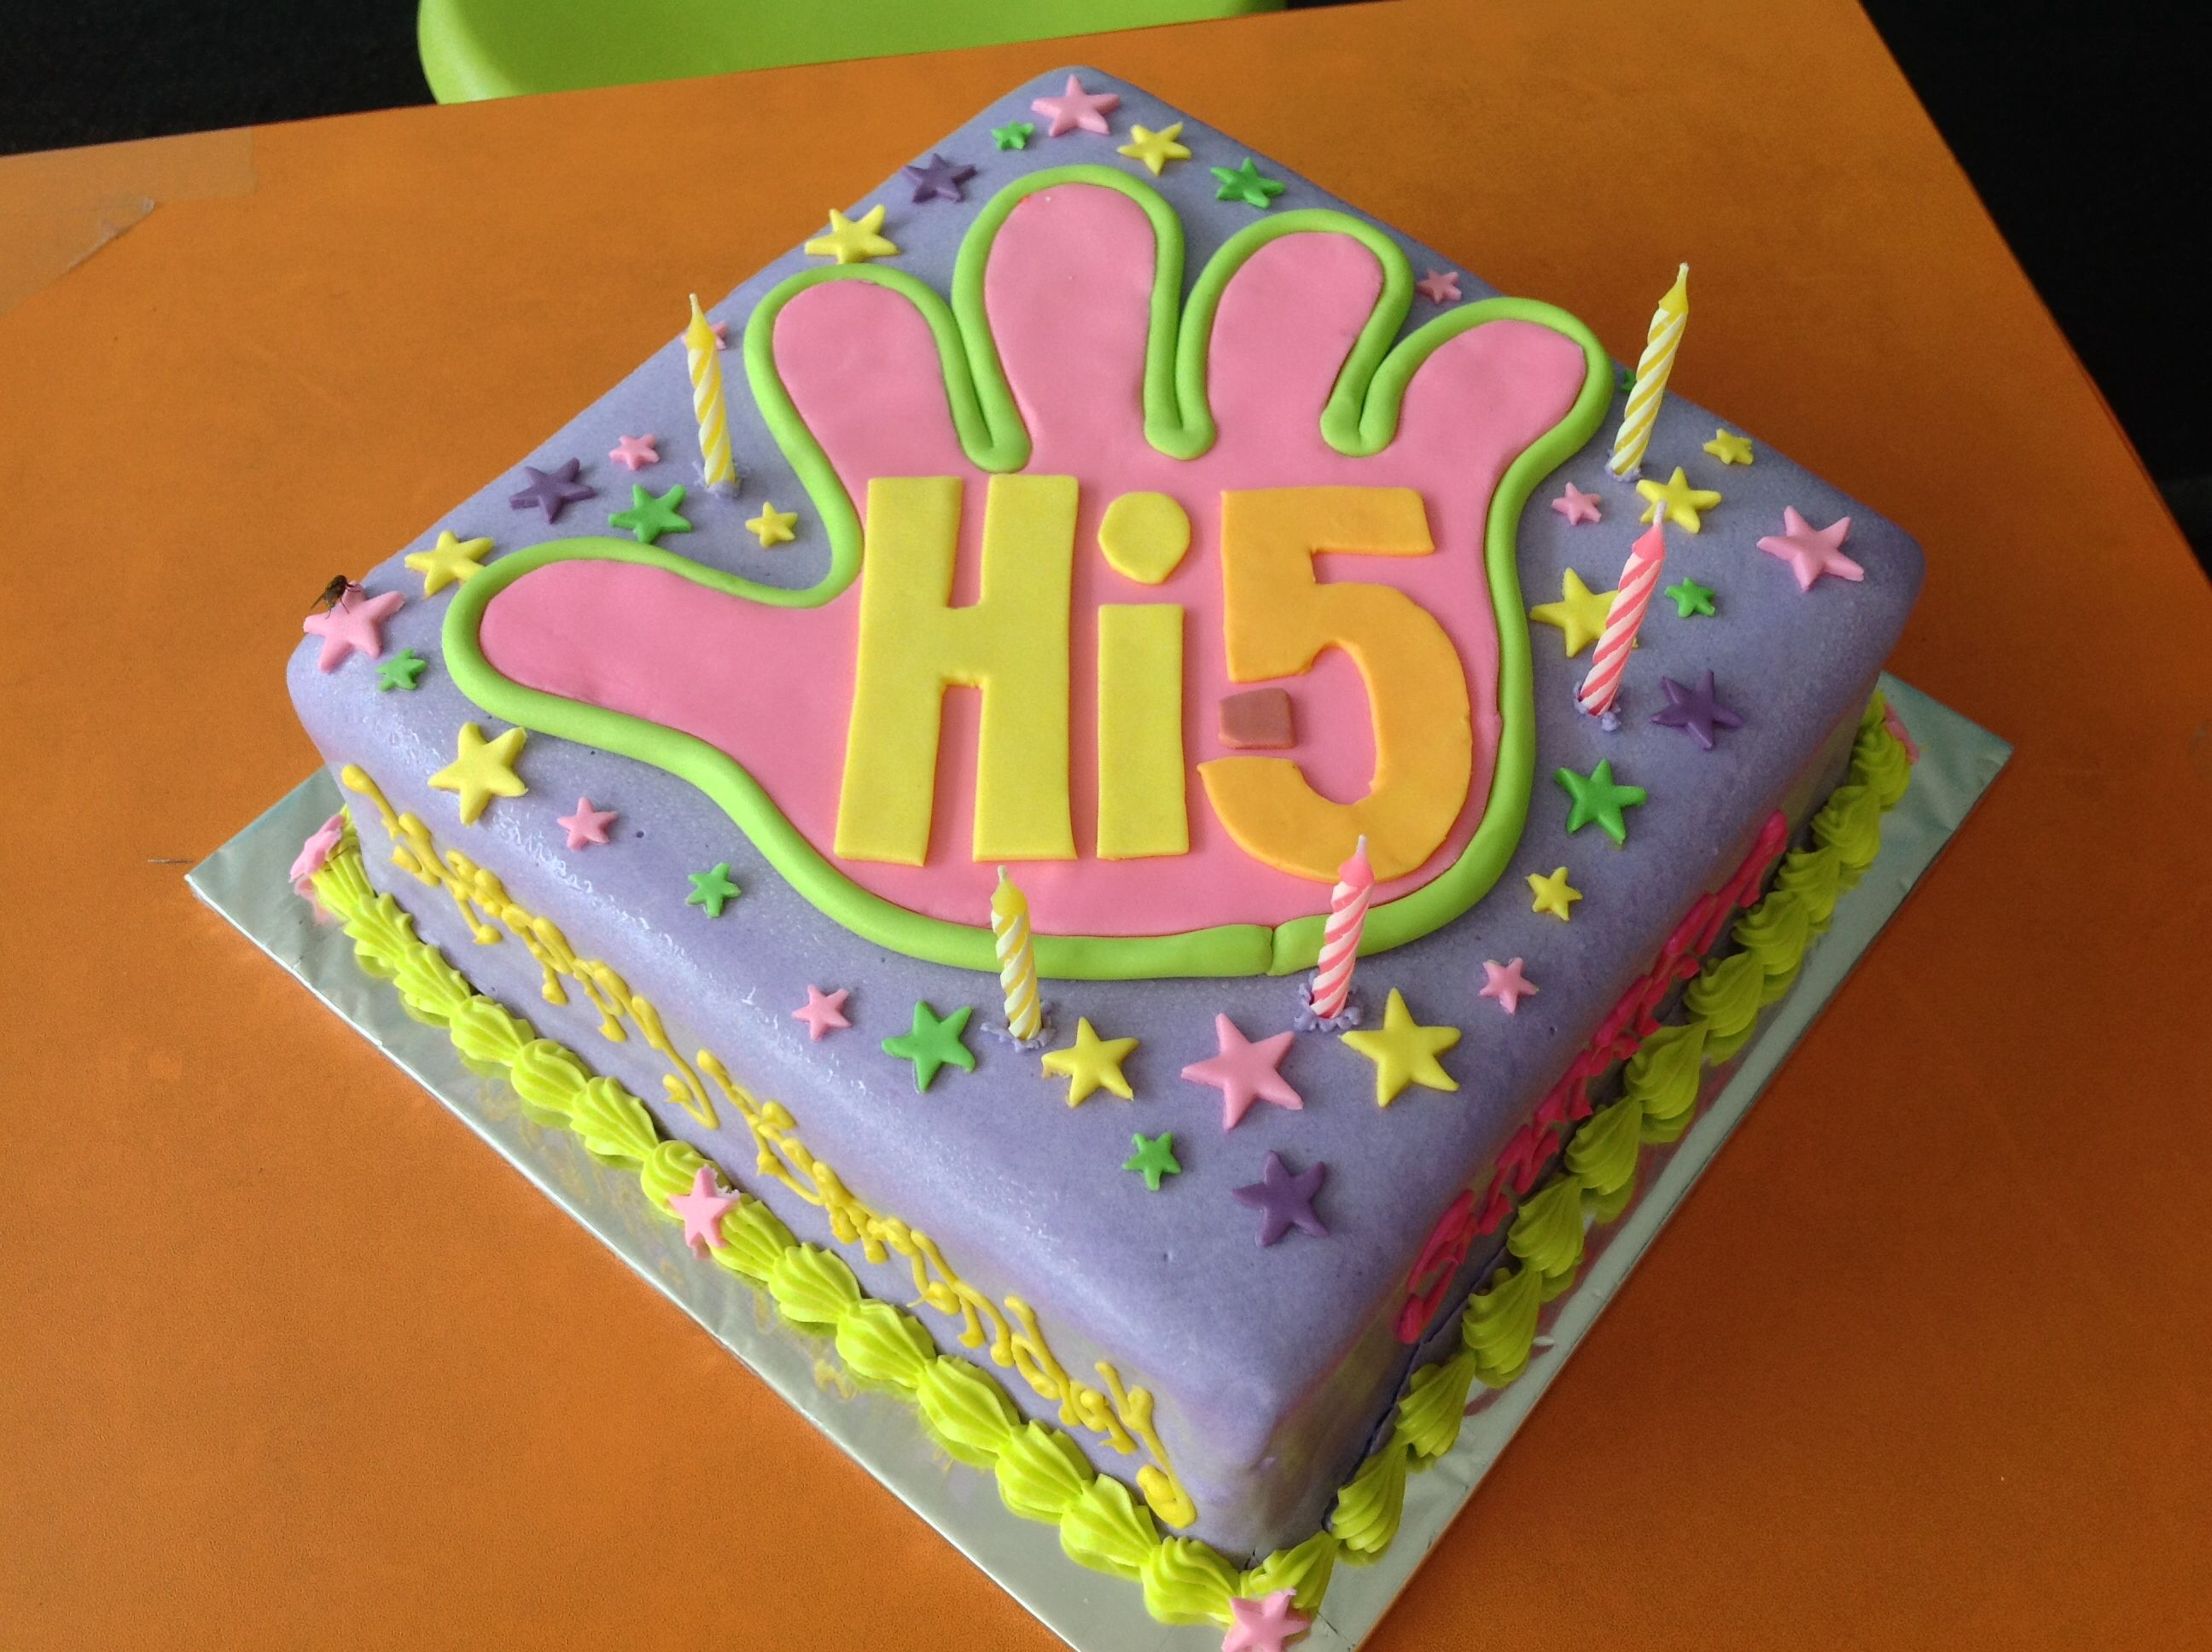 Astounding Hi 5 Birthday Cake 5Th Birthday Cake Birthday Kids Birthday Funny Birthday Cards Online Bapapcheapnameinfo